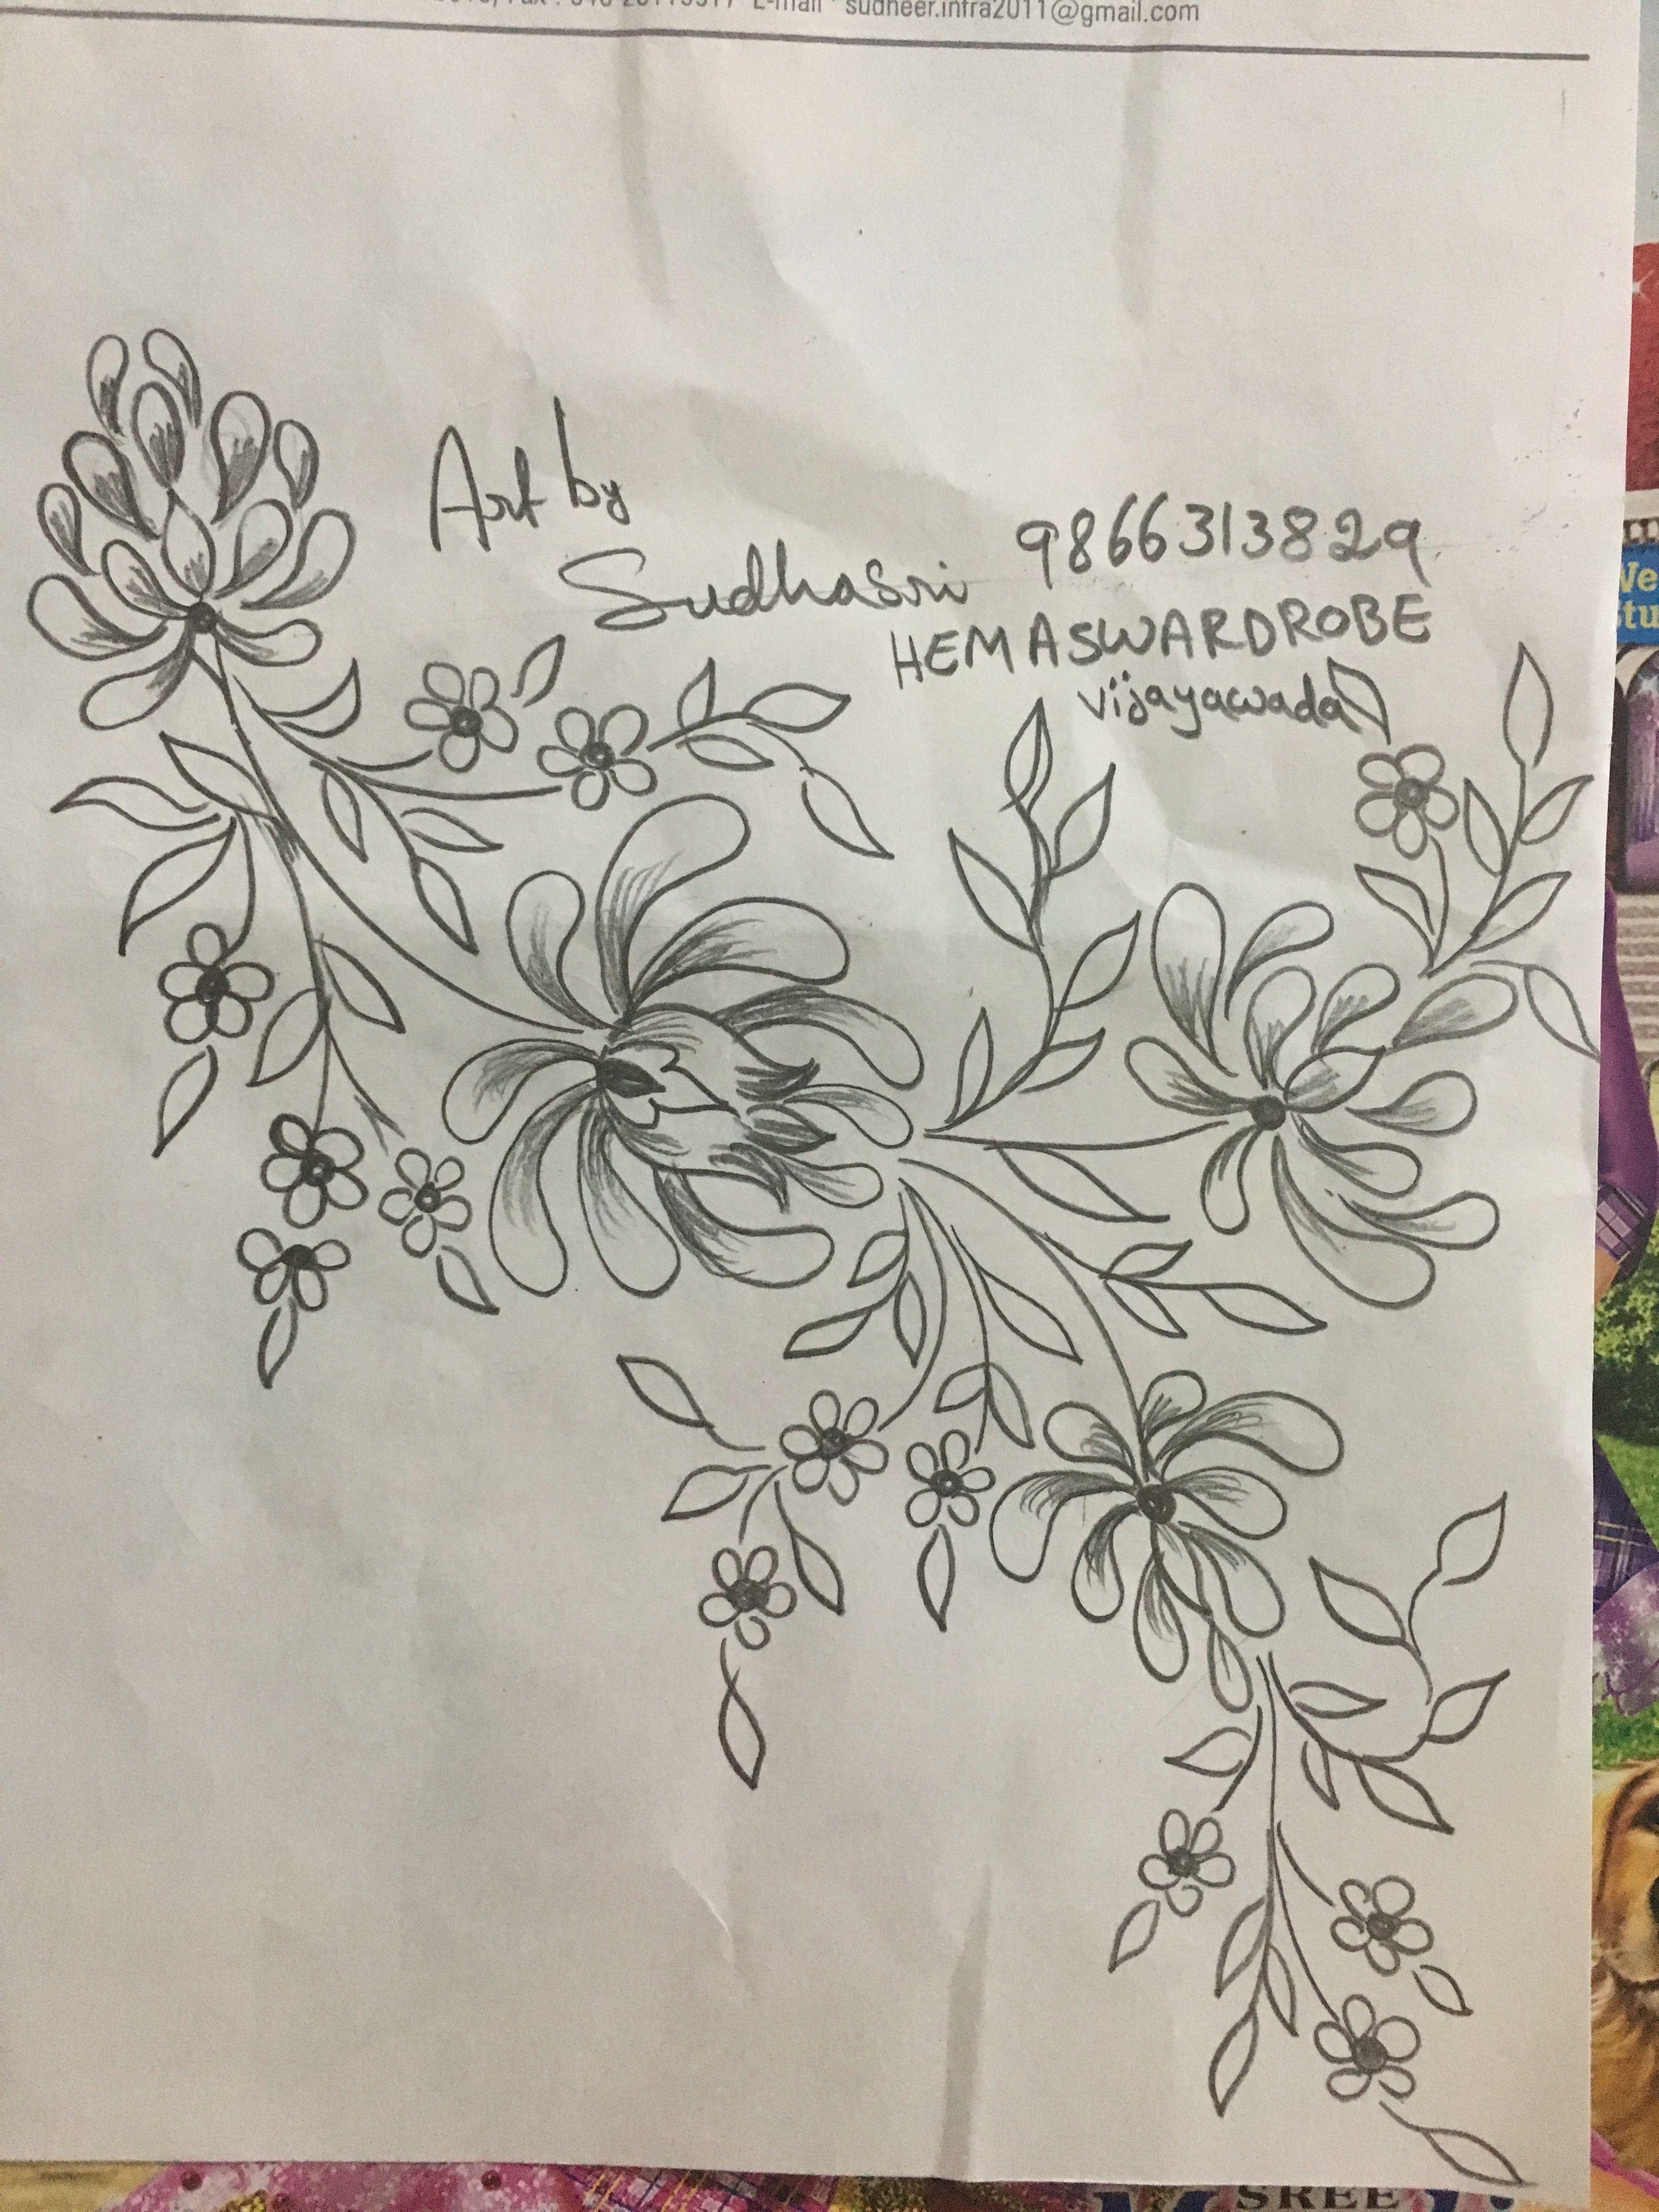 Sudhasri hemaswardrobe borders pinterest embroidery patterns